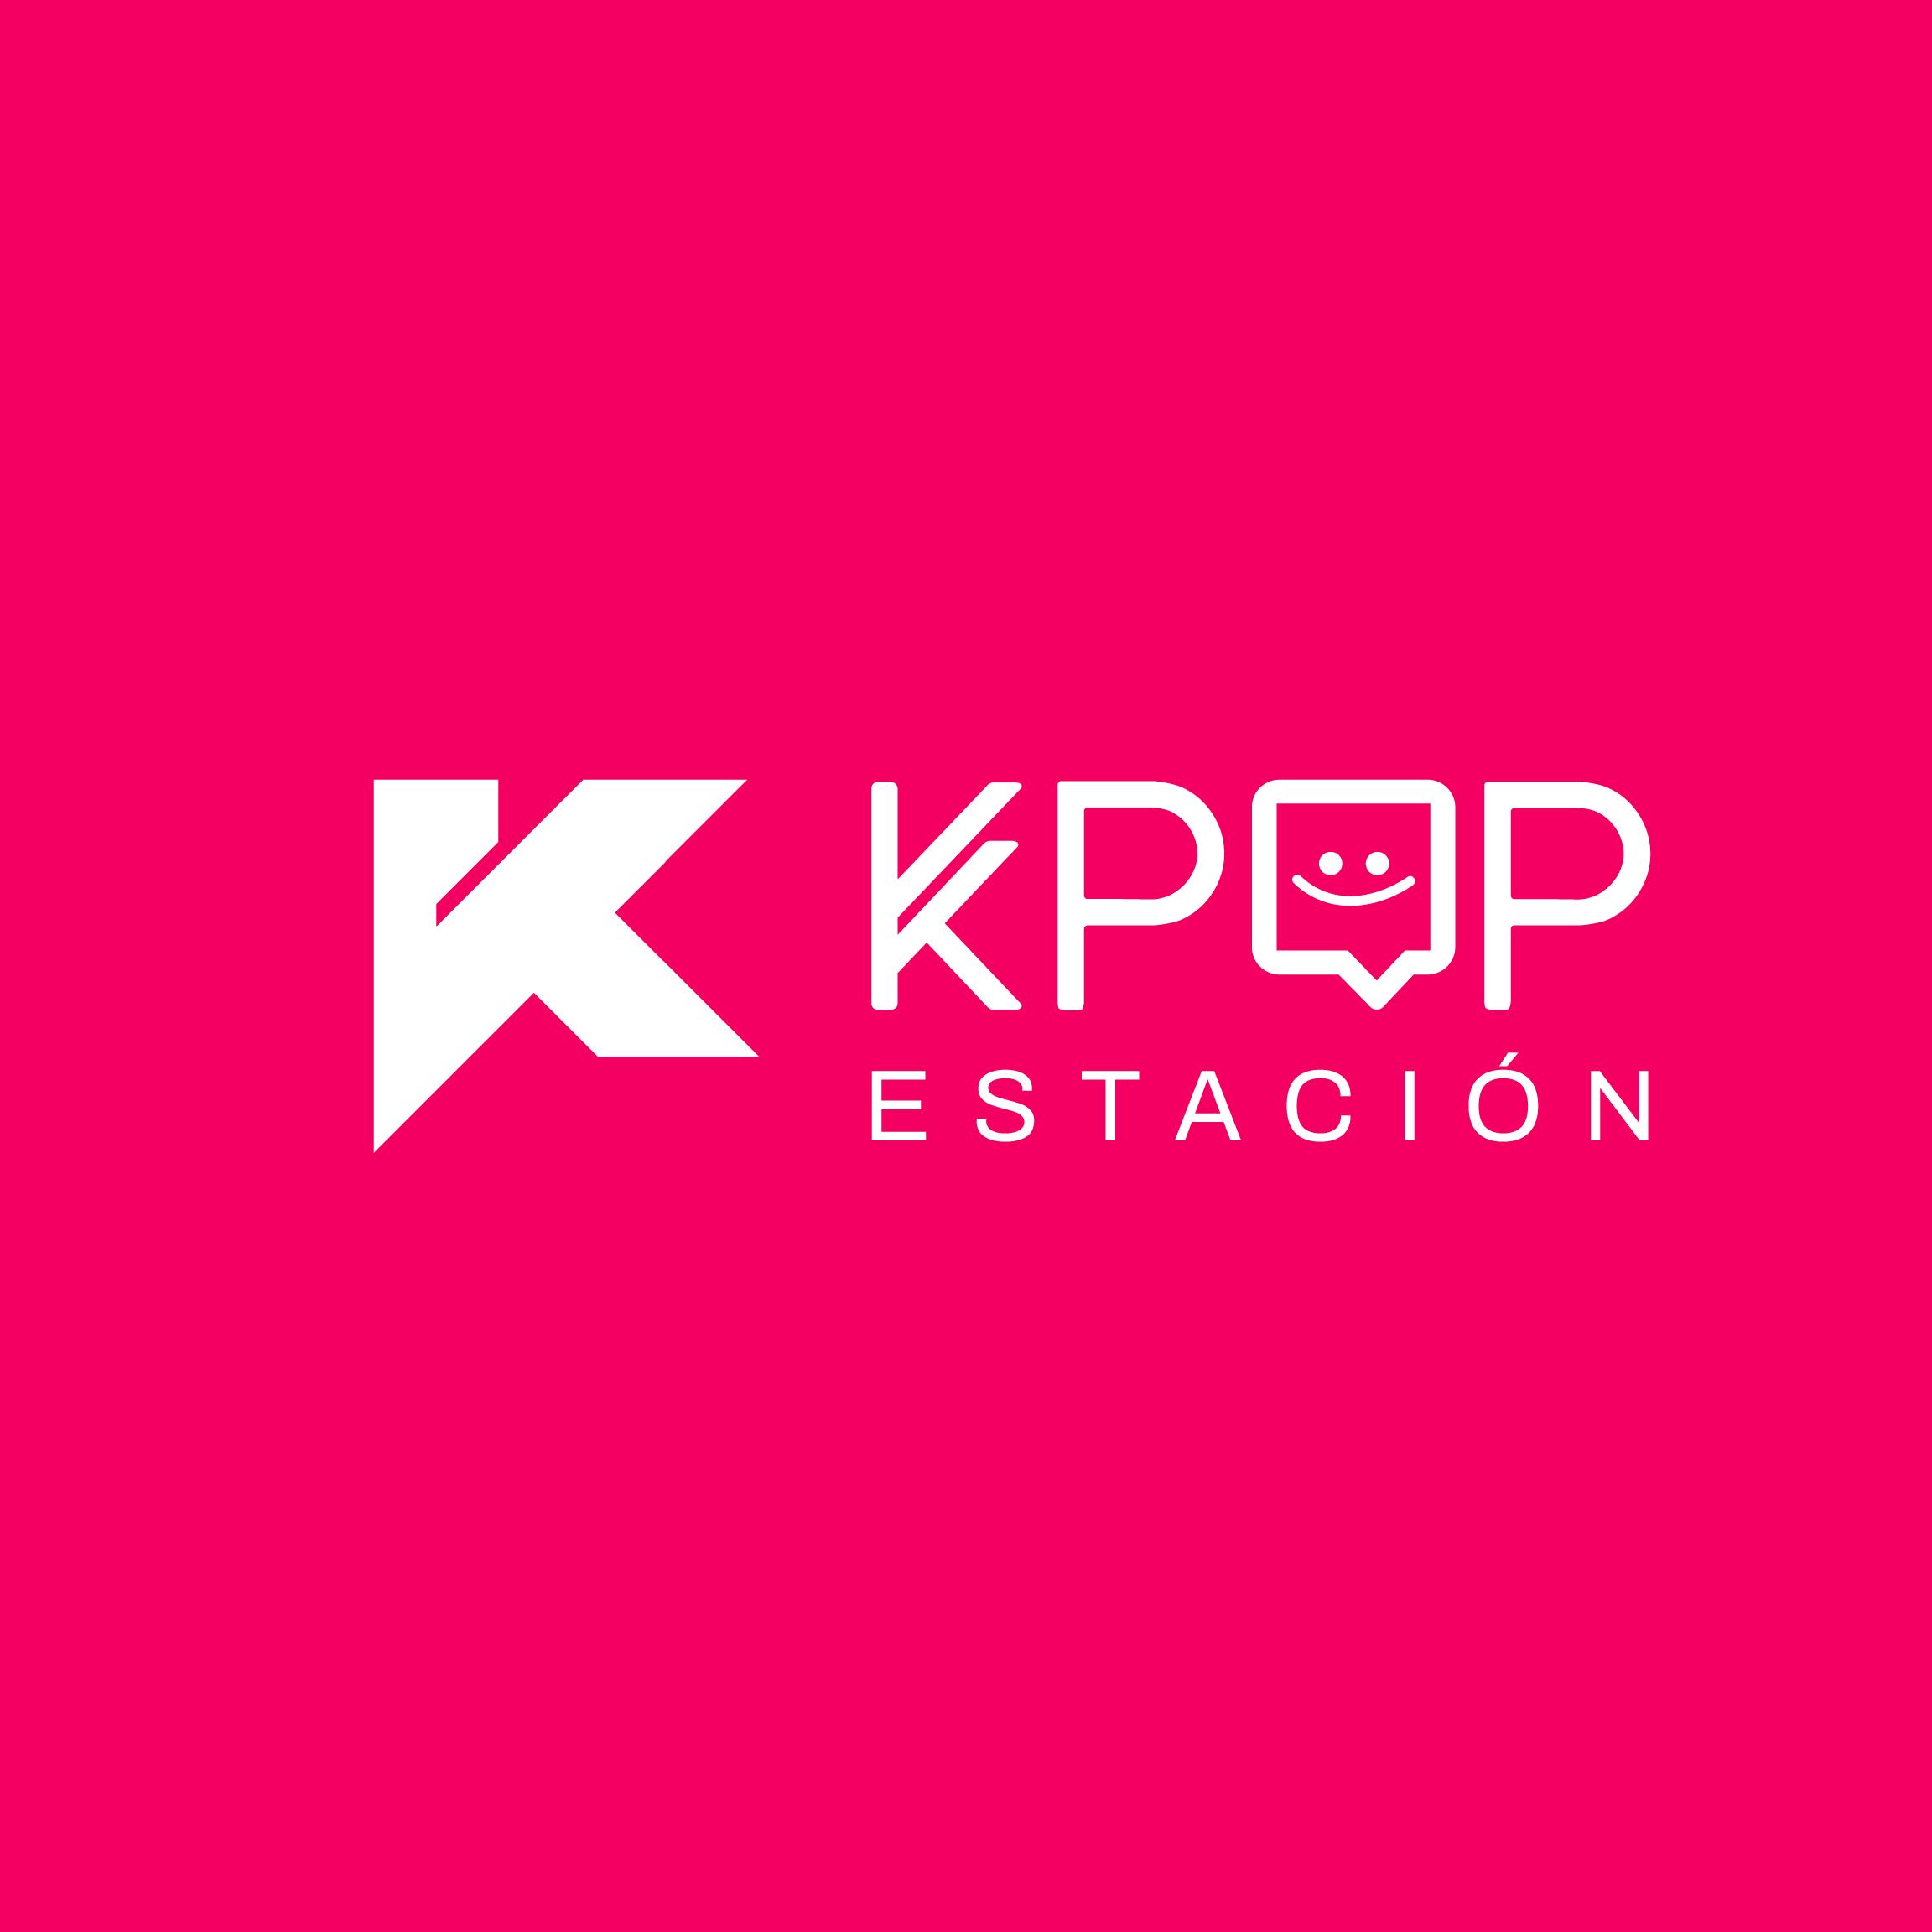 kpop45